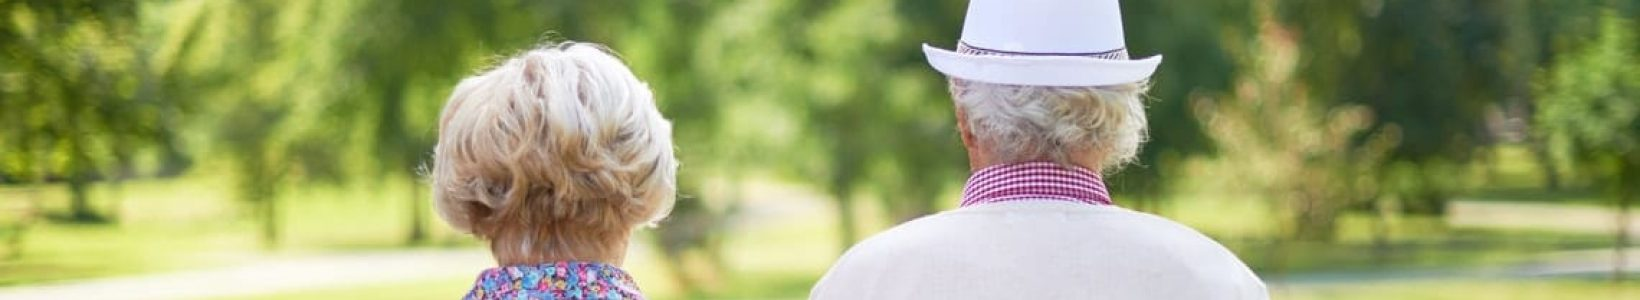 retirement planning tips couple walking park